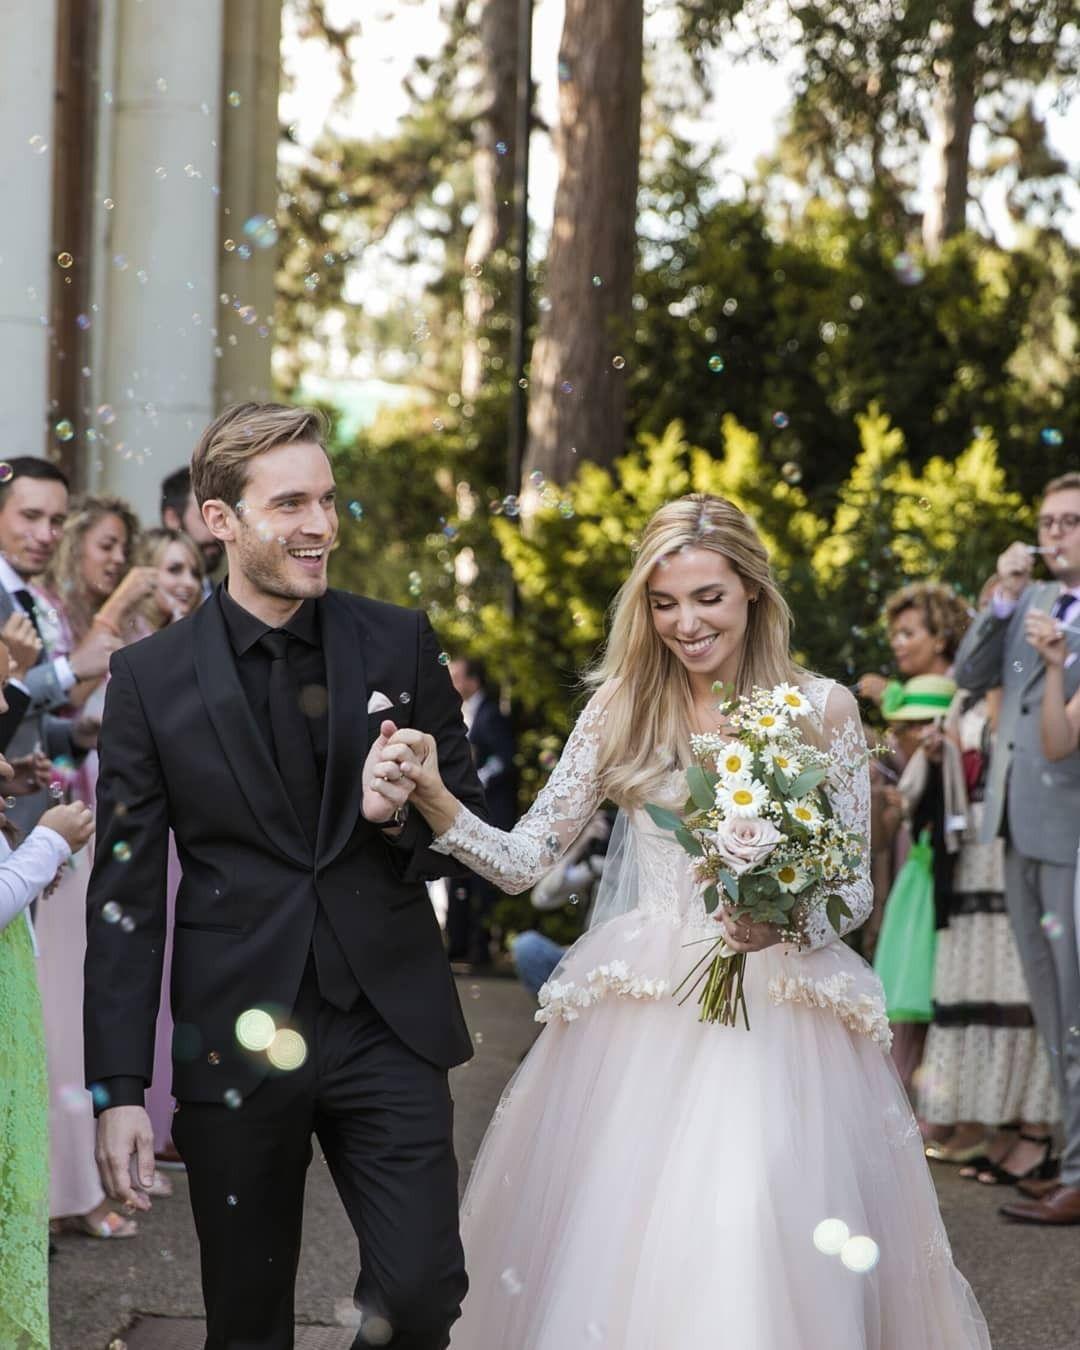 Felix Kjellberg & Marzia Bisognin HD Wallpaper | Wedding ...